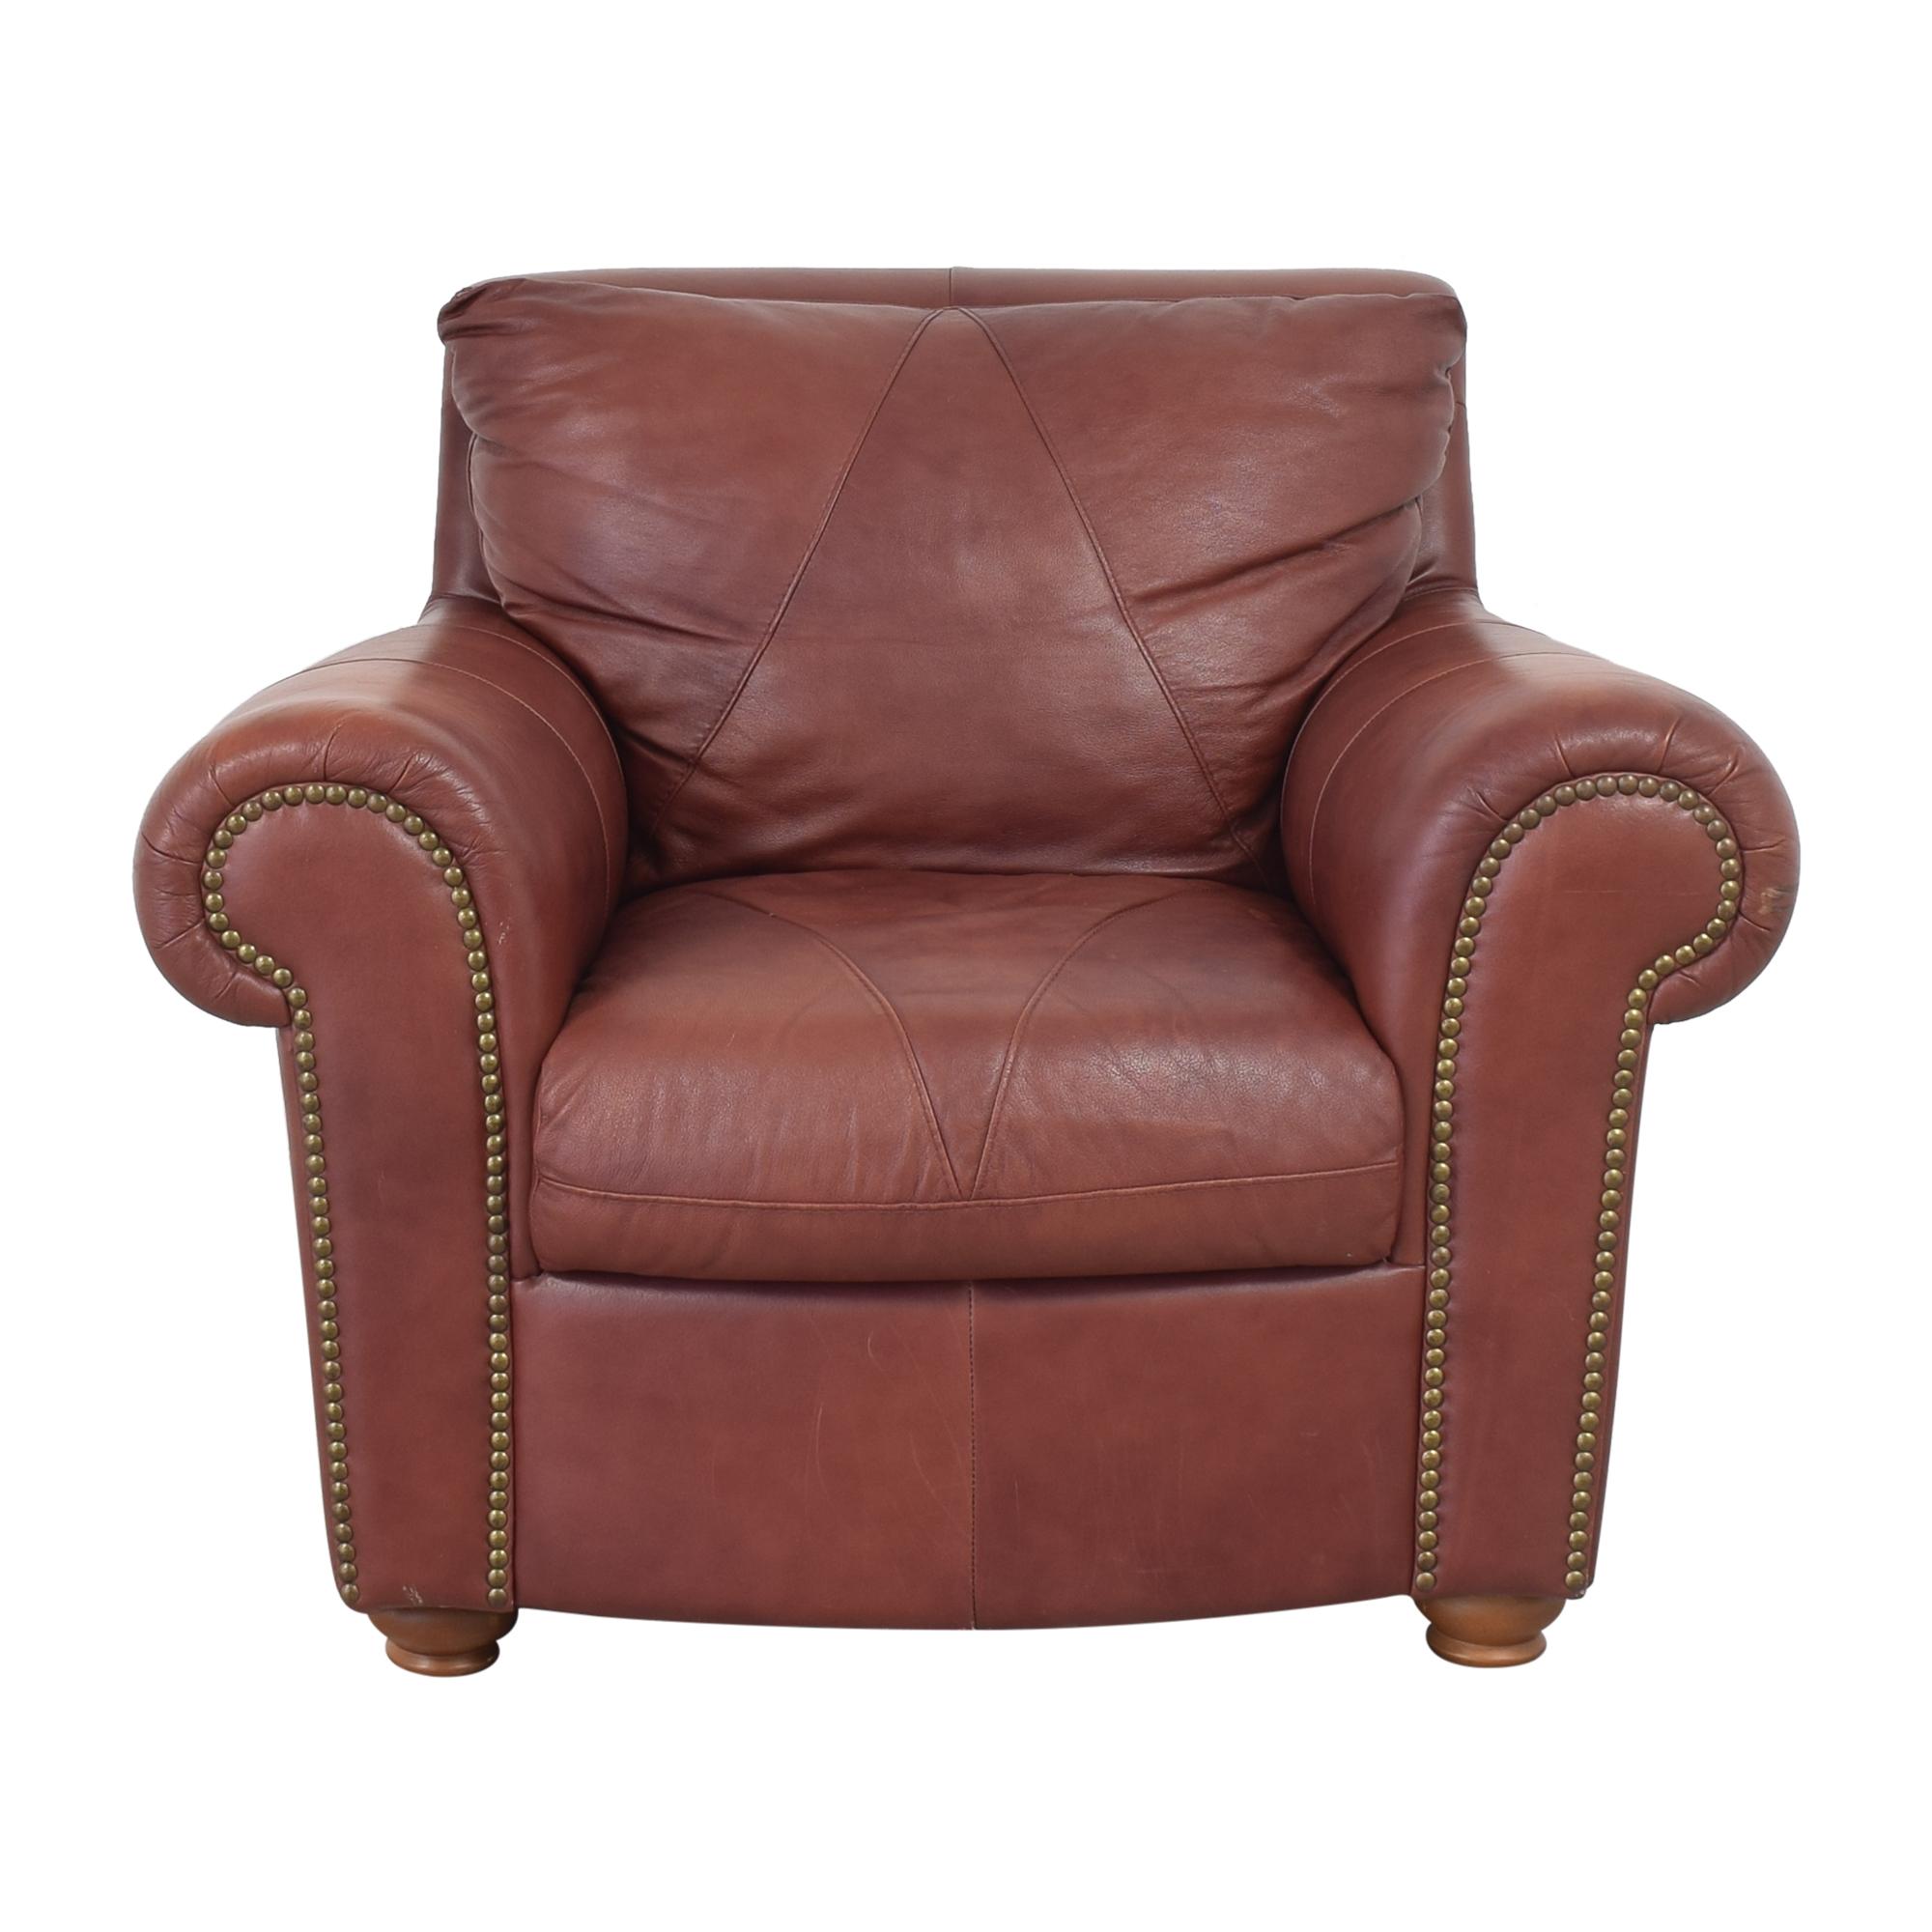 Softline Softline Roll Arm Nailhead Chair dimensions